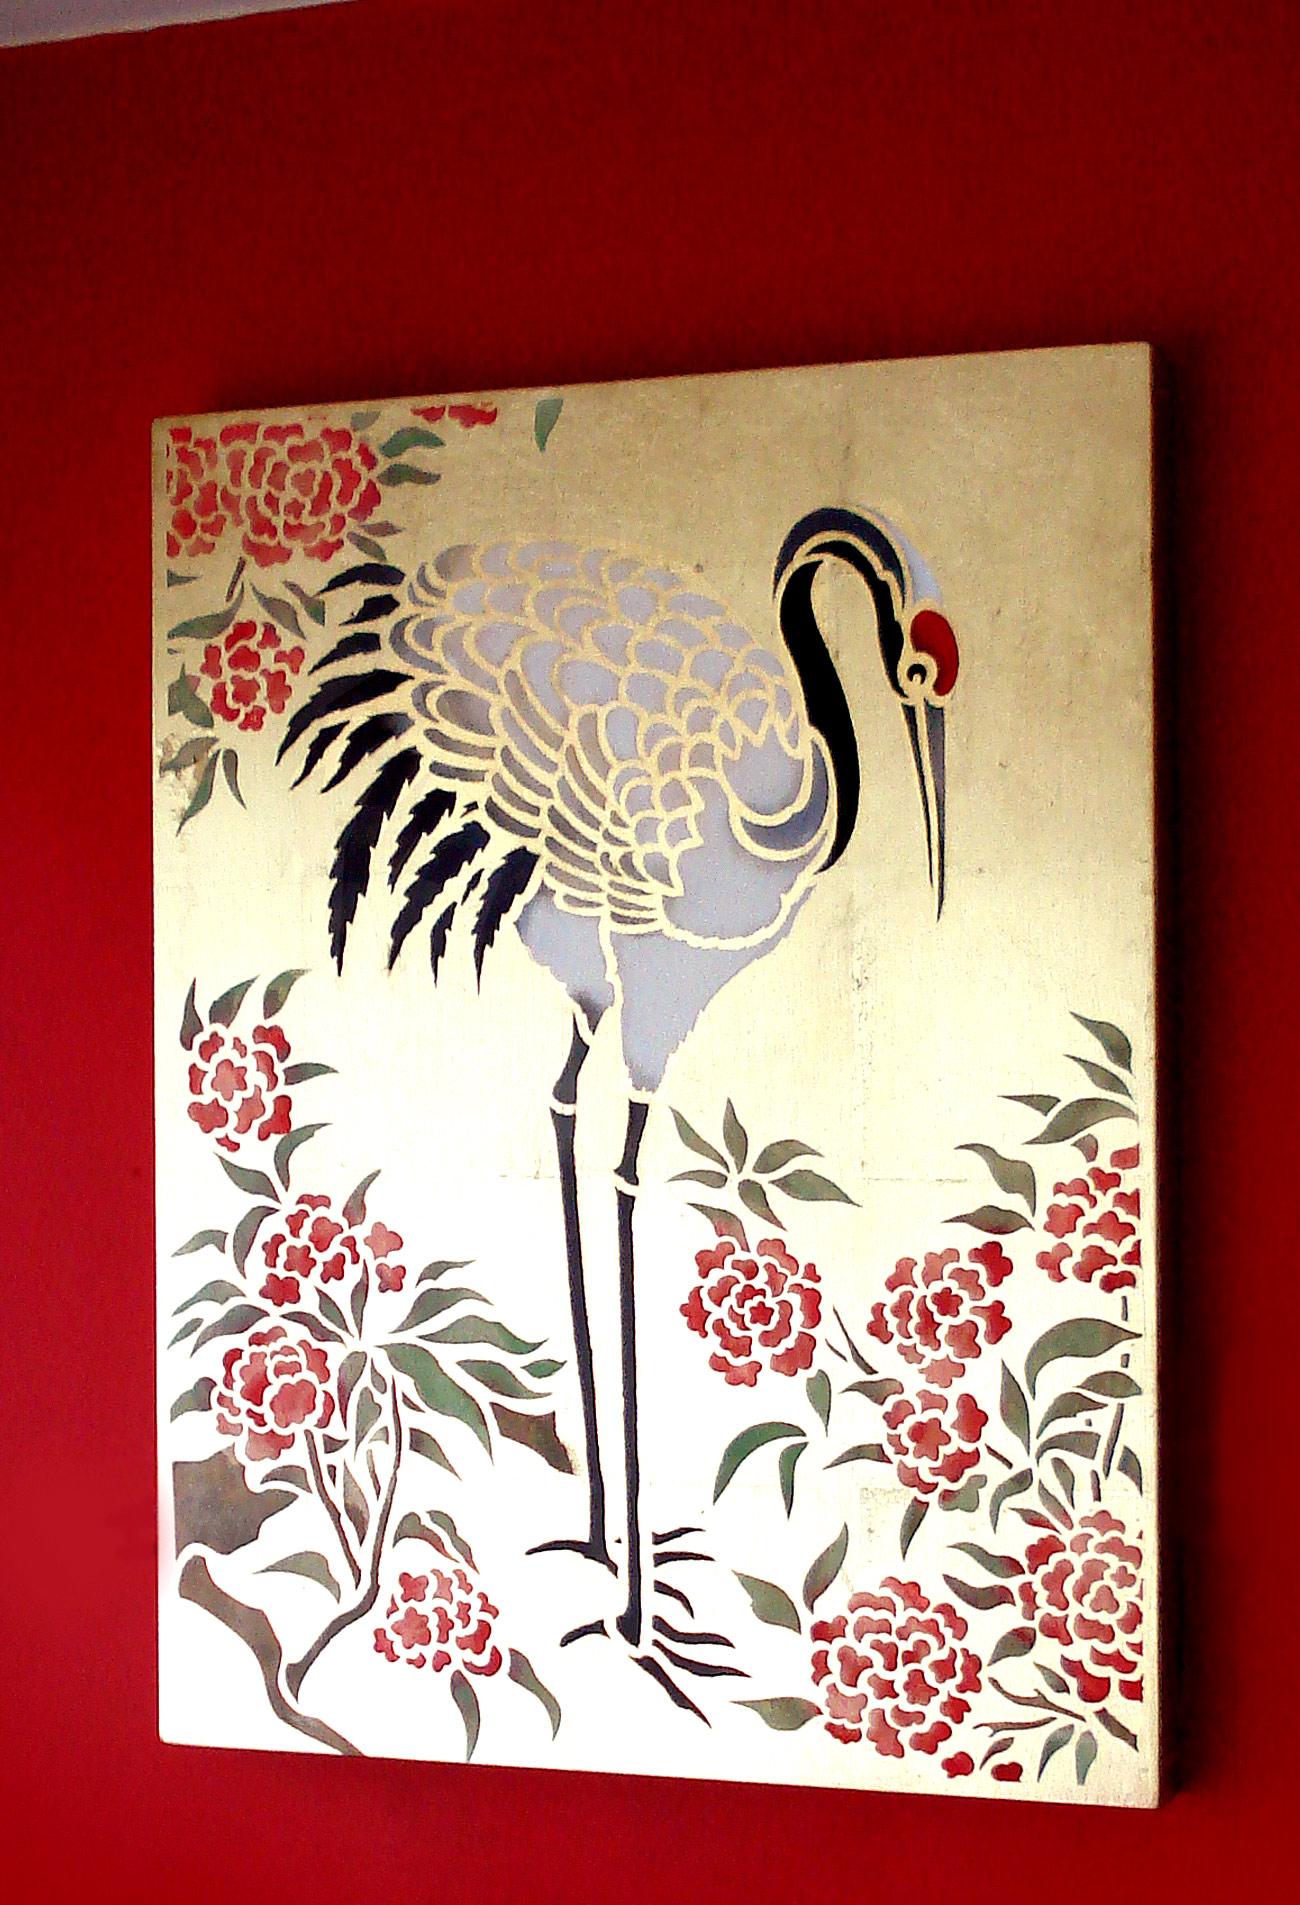 Large Standing Cranes Stencil: Large Standing Cranes Stencil